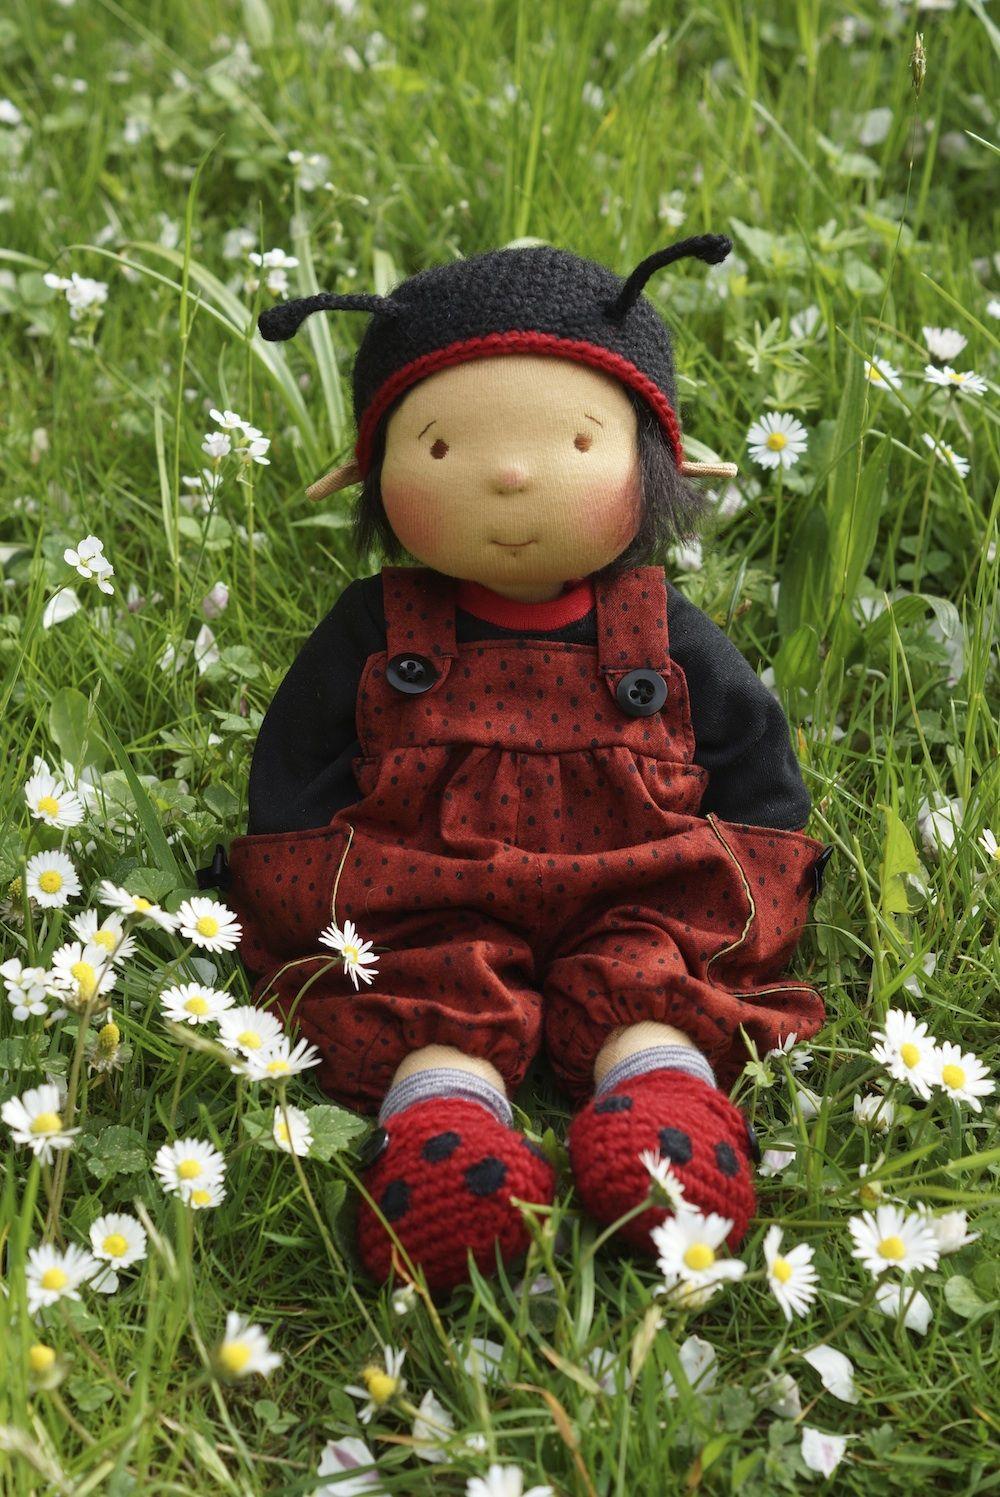 daisy dolly!                                                                                                                                                                                 Mehr #dollies